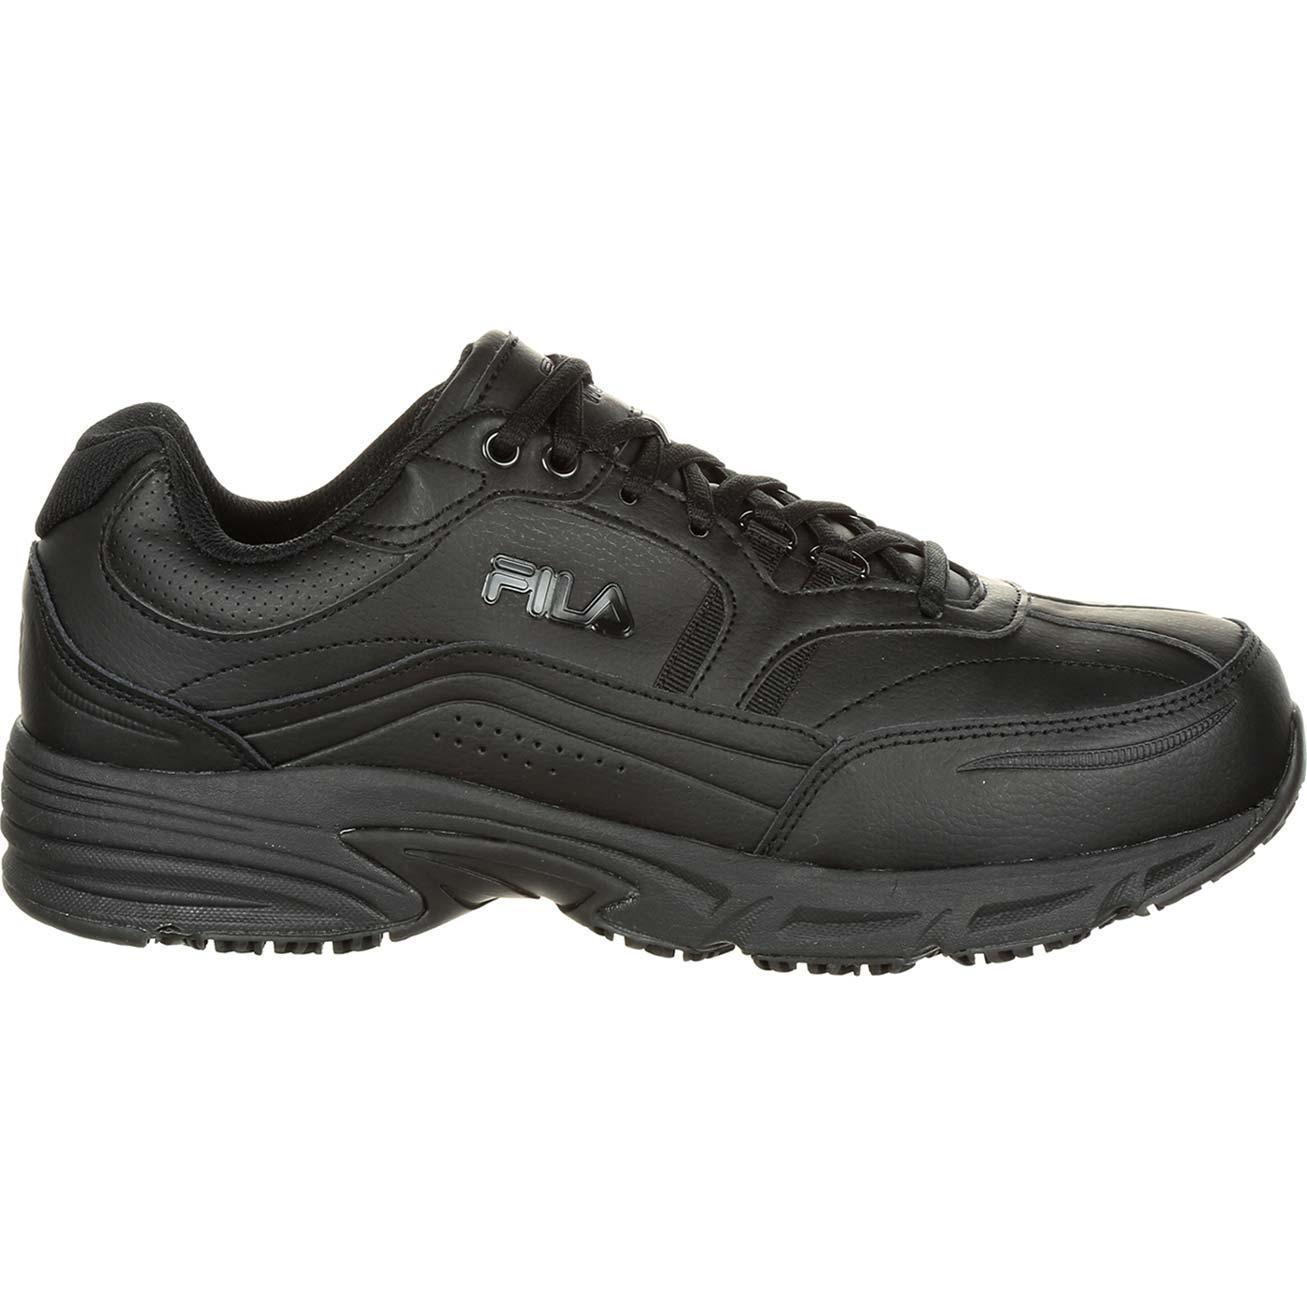 4d30109662 Fila Memory Workshift Steel Toe Slip-Resistant Work Athletic Shoe